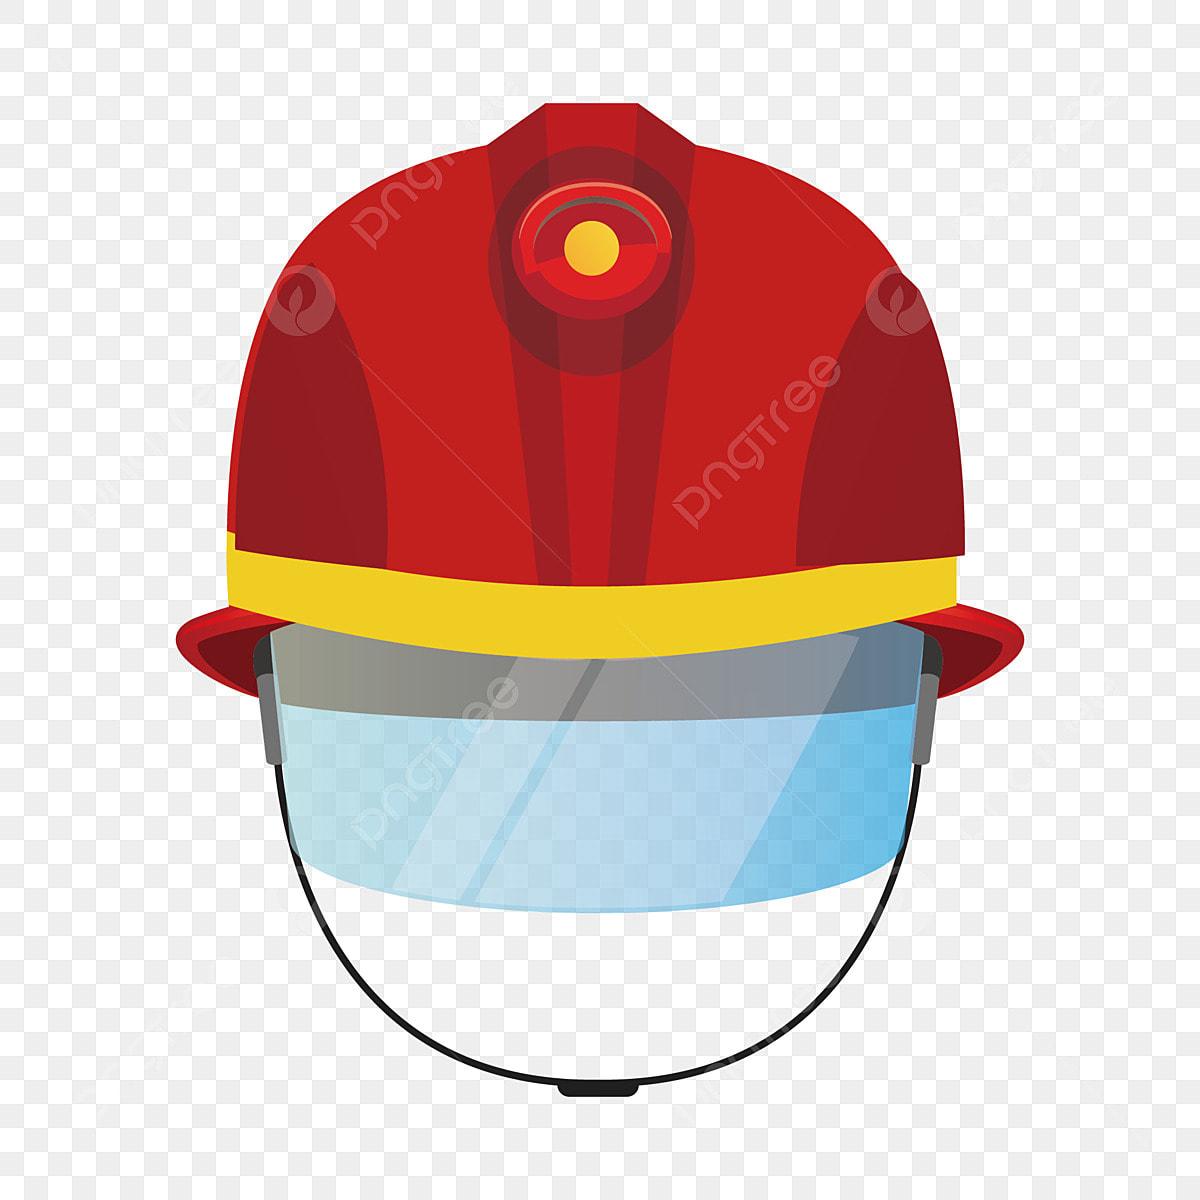 Red Hard Hat Sturdy Helmet Beautiful Hard Hat Fire Helmet